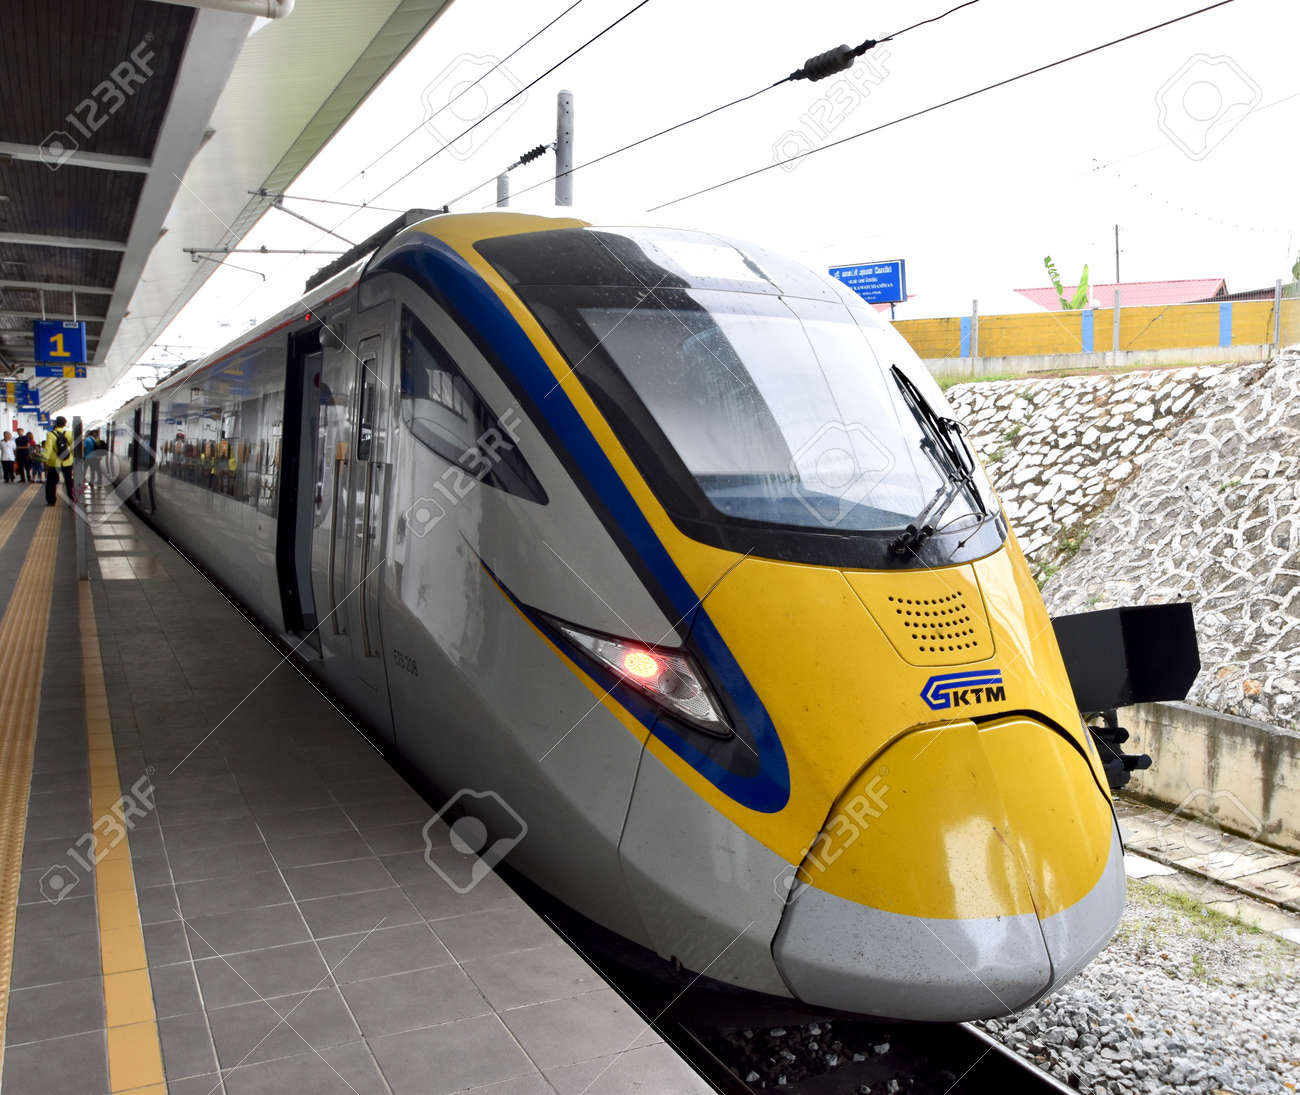 ets train inter city rail service in malaysia stock photo picture